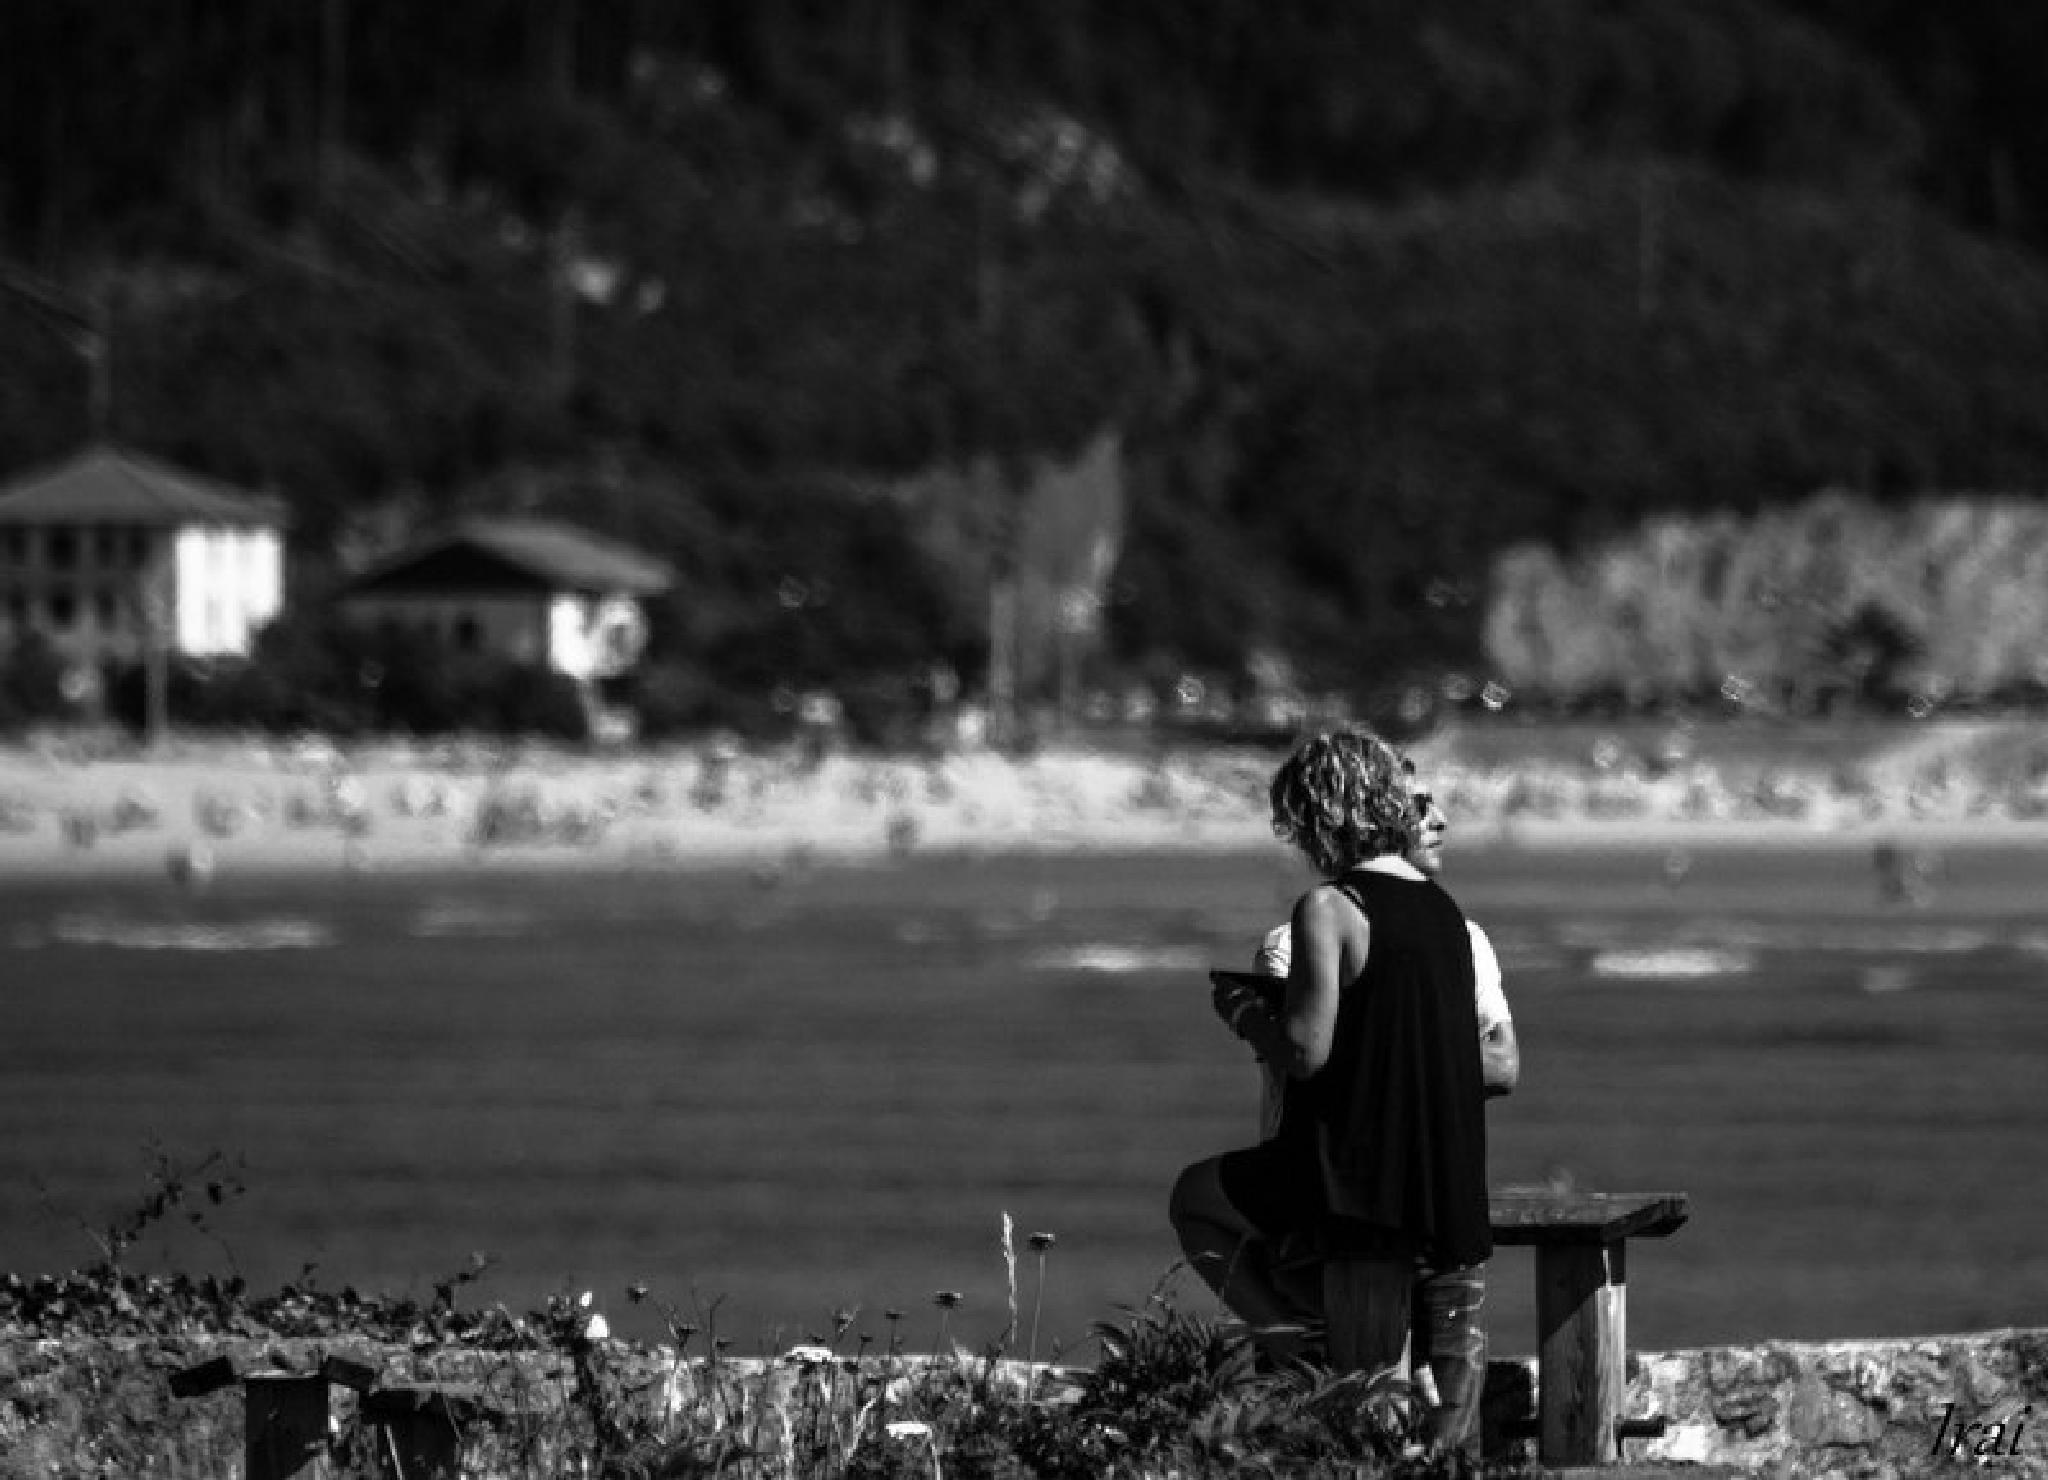 Relaxing in the paradise. Mundaka by Irai